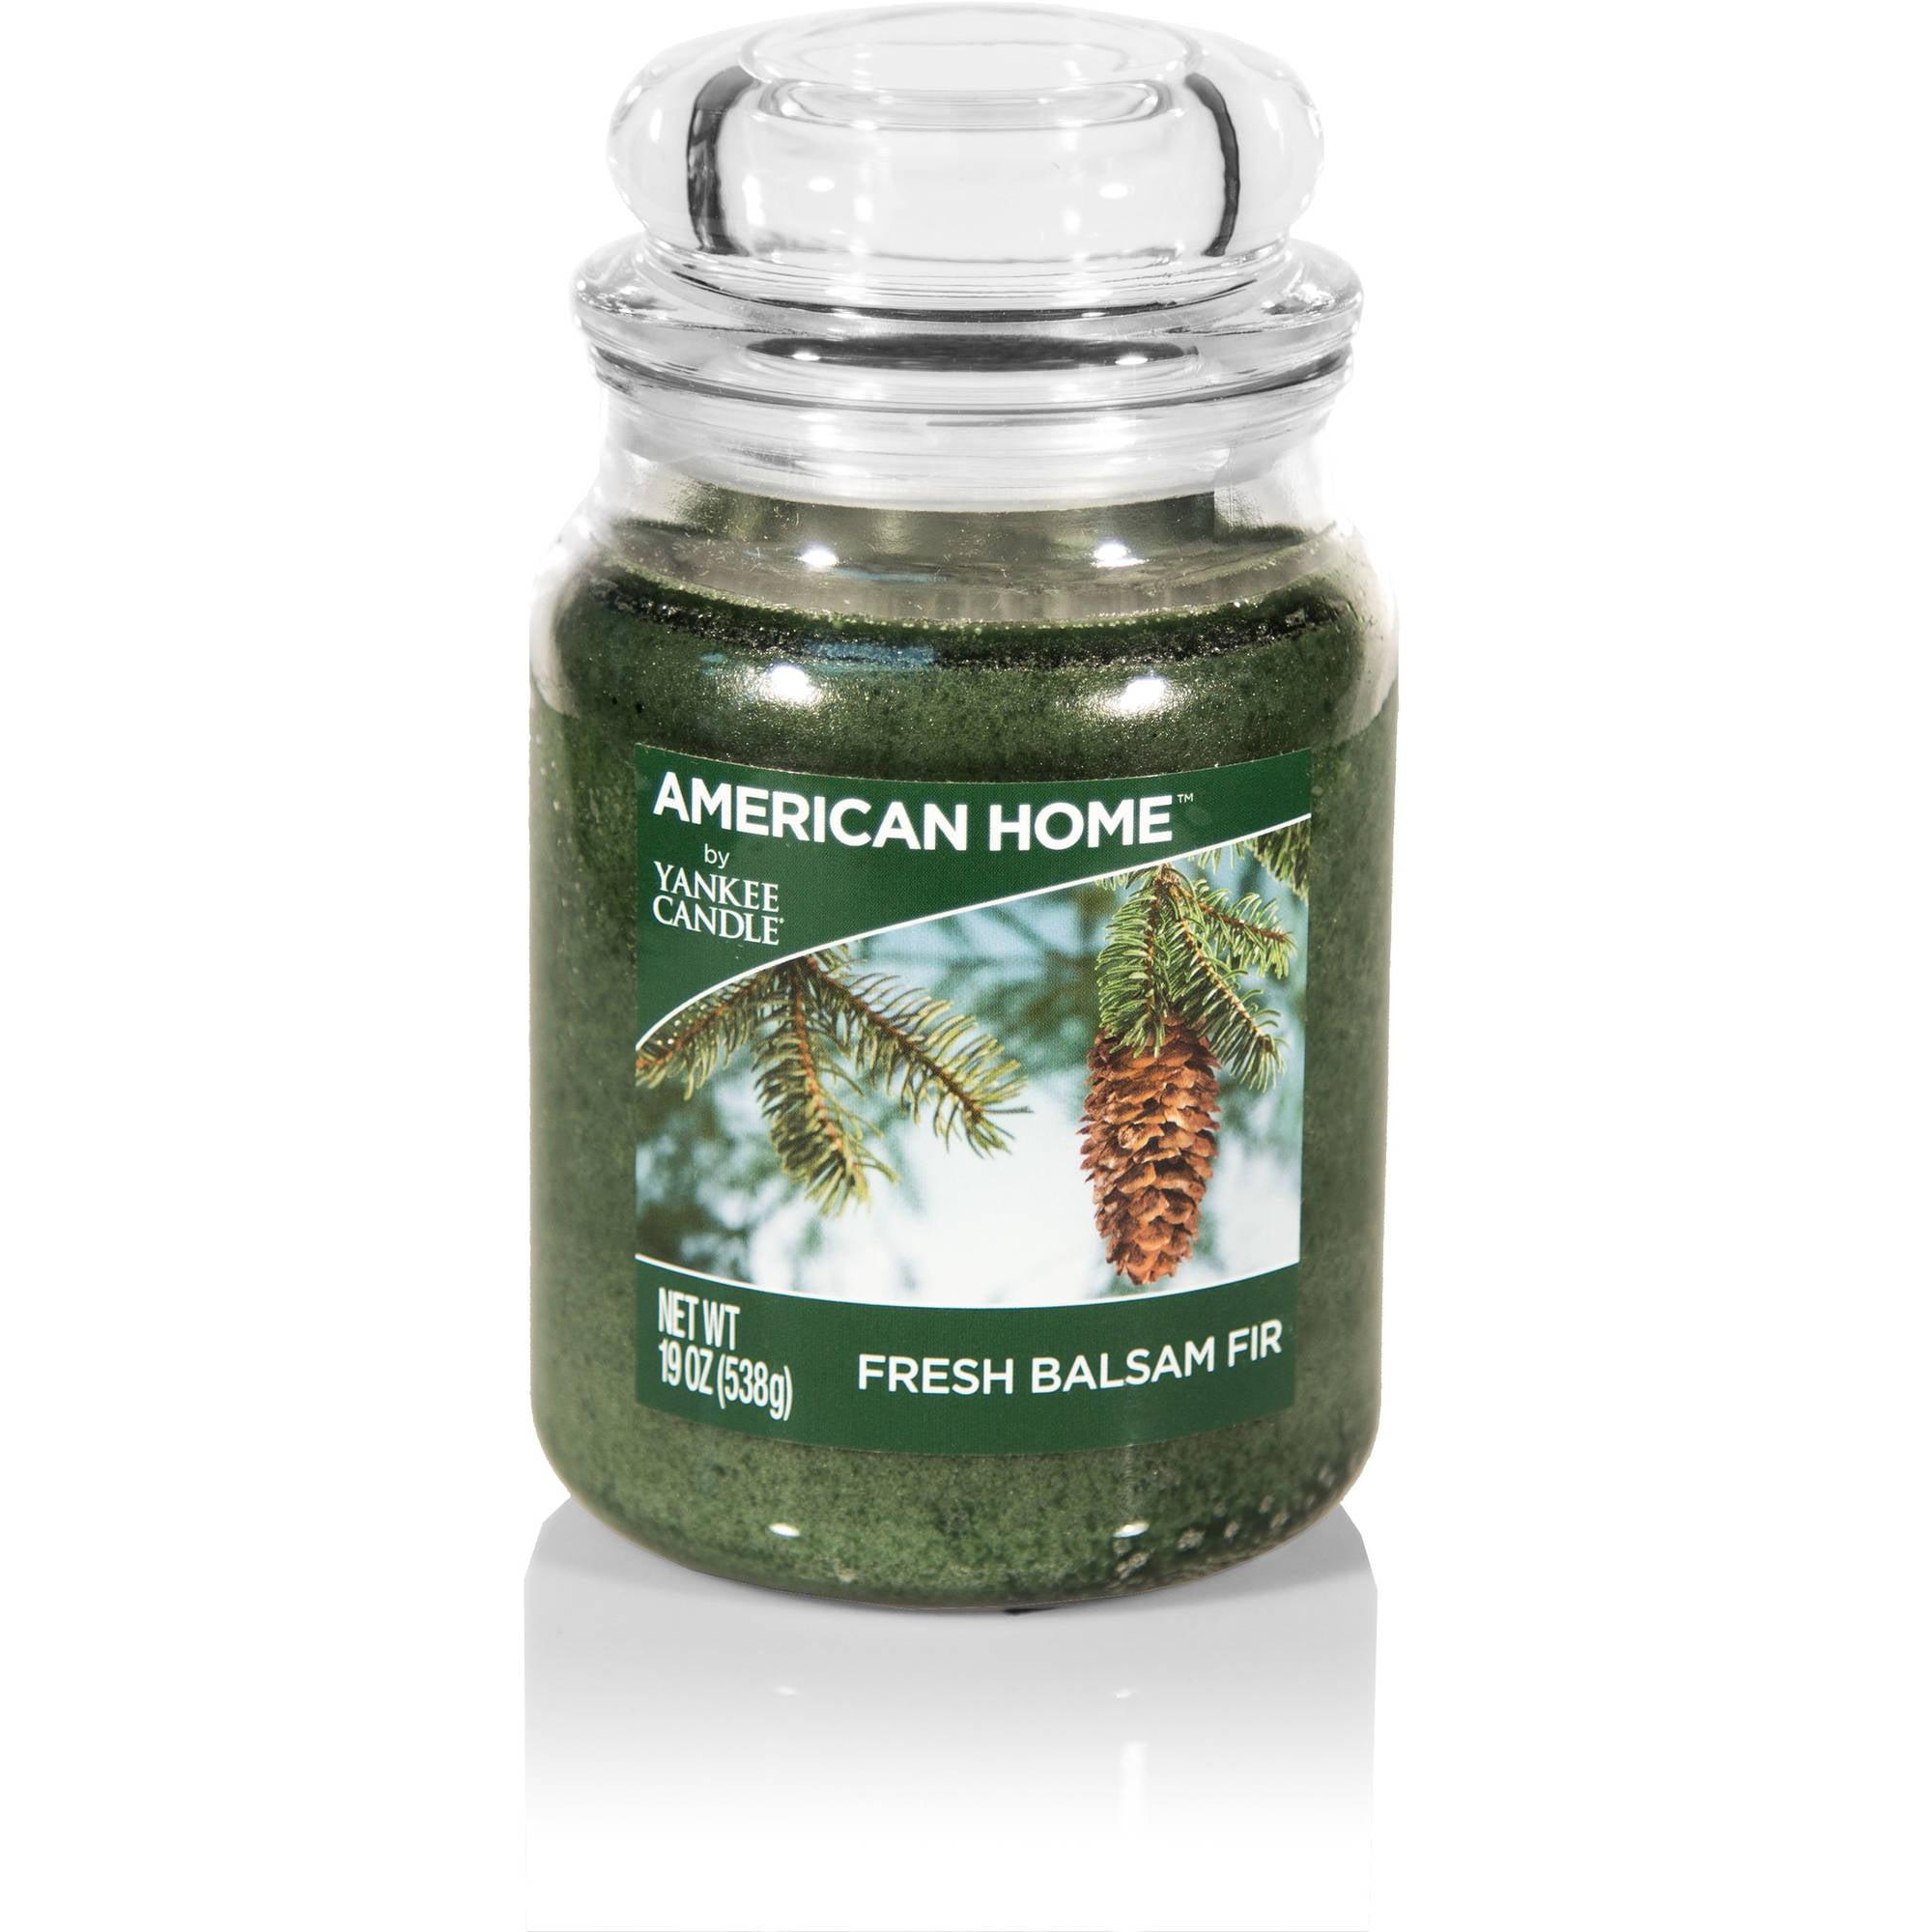 American Home by Yankee Candle Fresh Balsam Fir Candle, 19 oz Large Jar